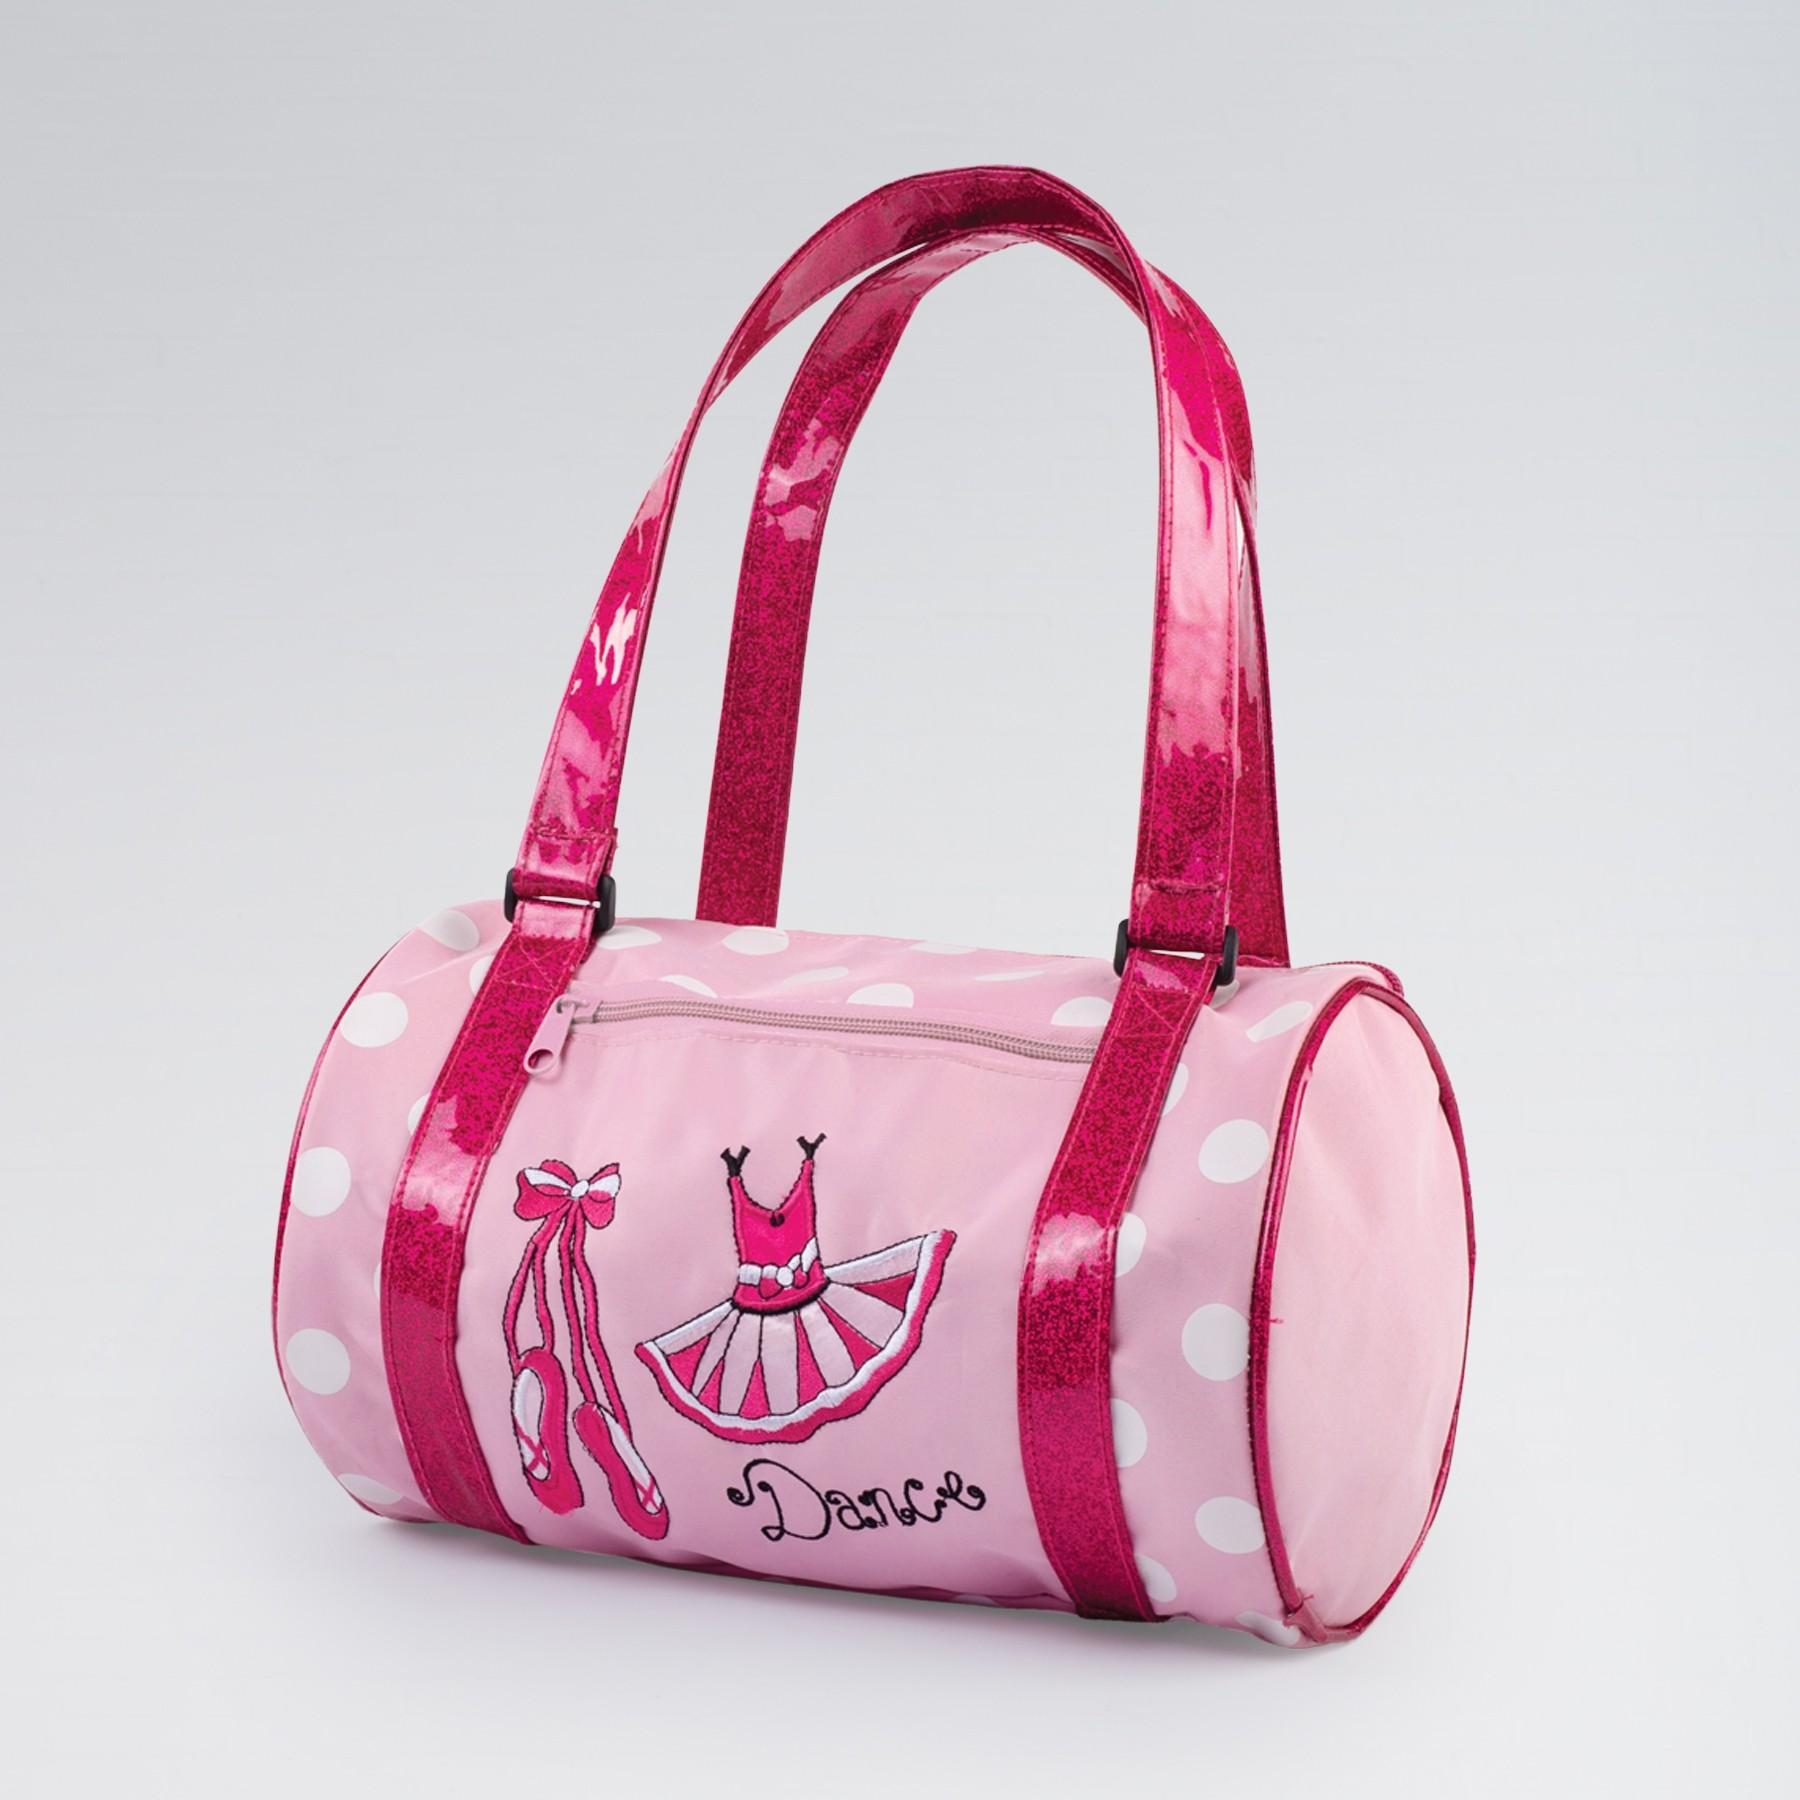 1st Position Mini Barrel Bag